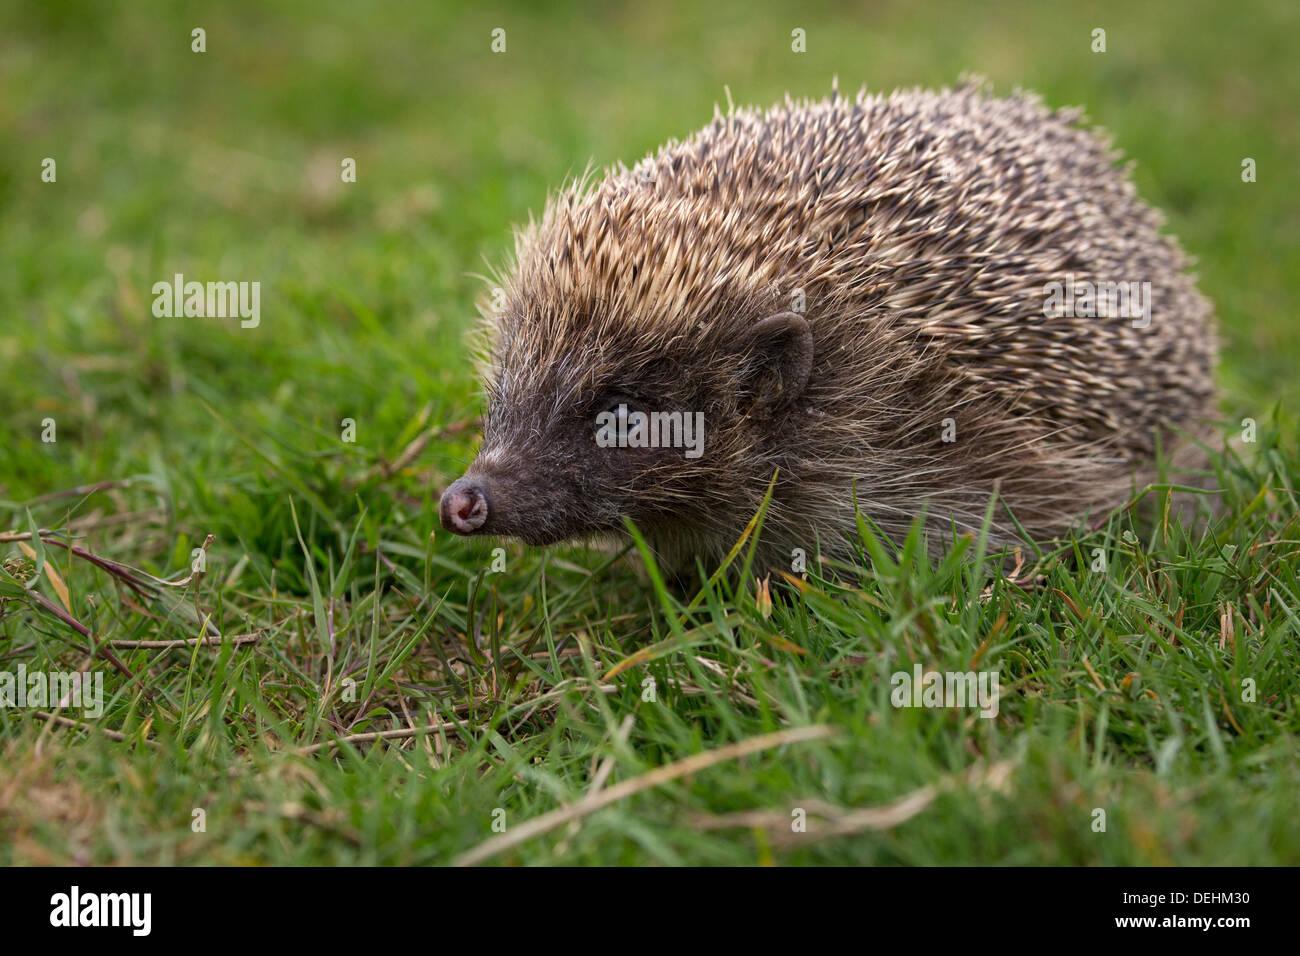 Hedgehog walking on grass - Stock Image